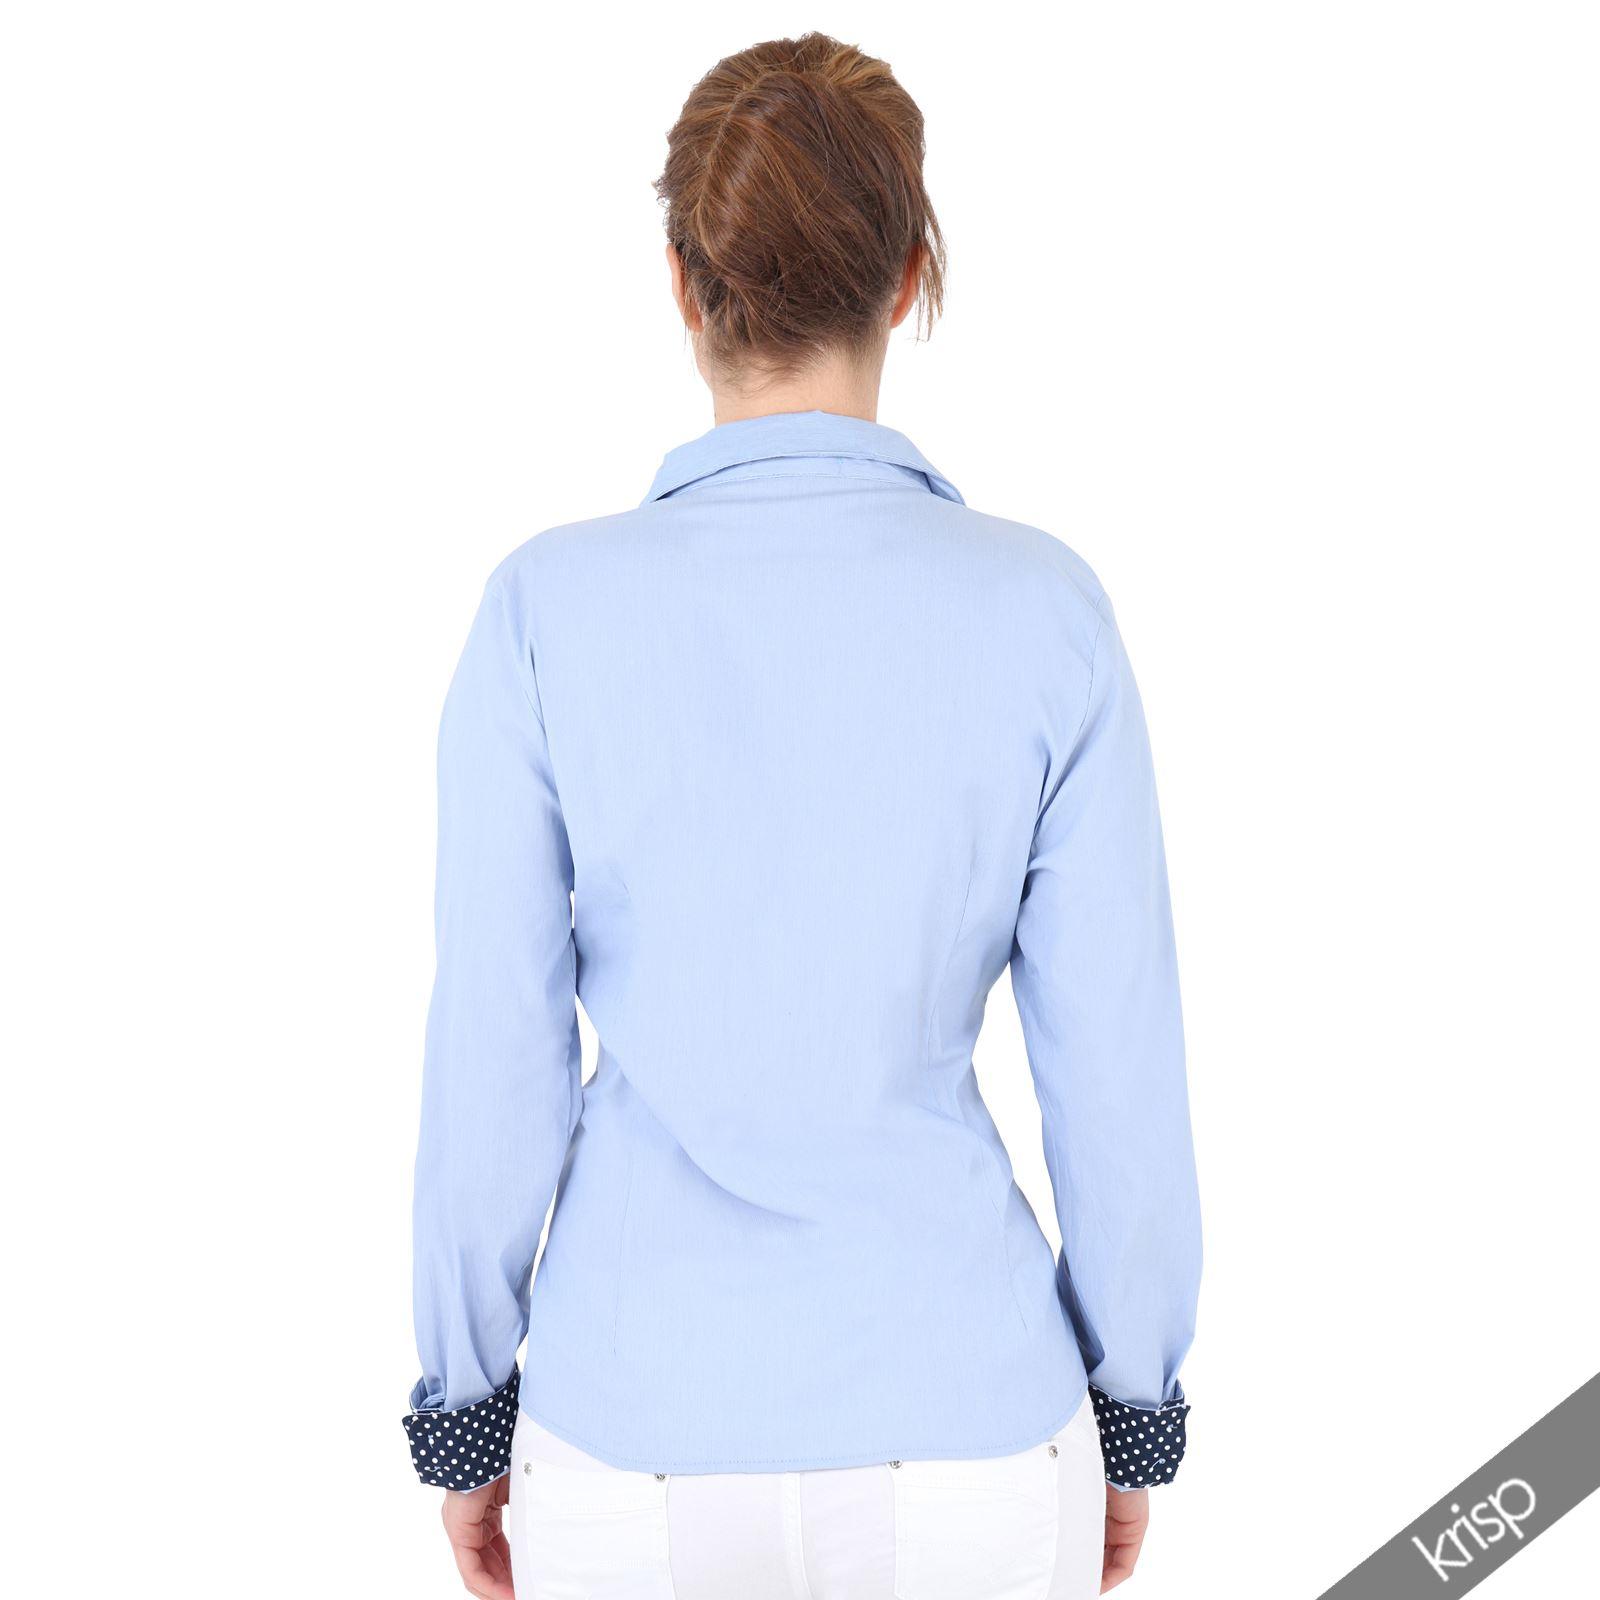 Kleidung & Accessoires > Damenmode > Blusen, Tops & Shirts